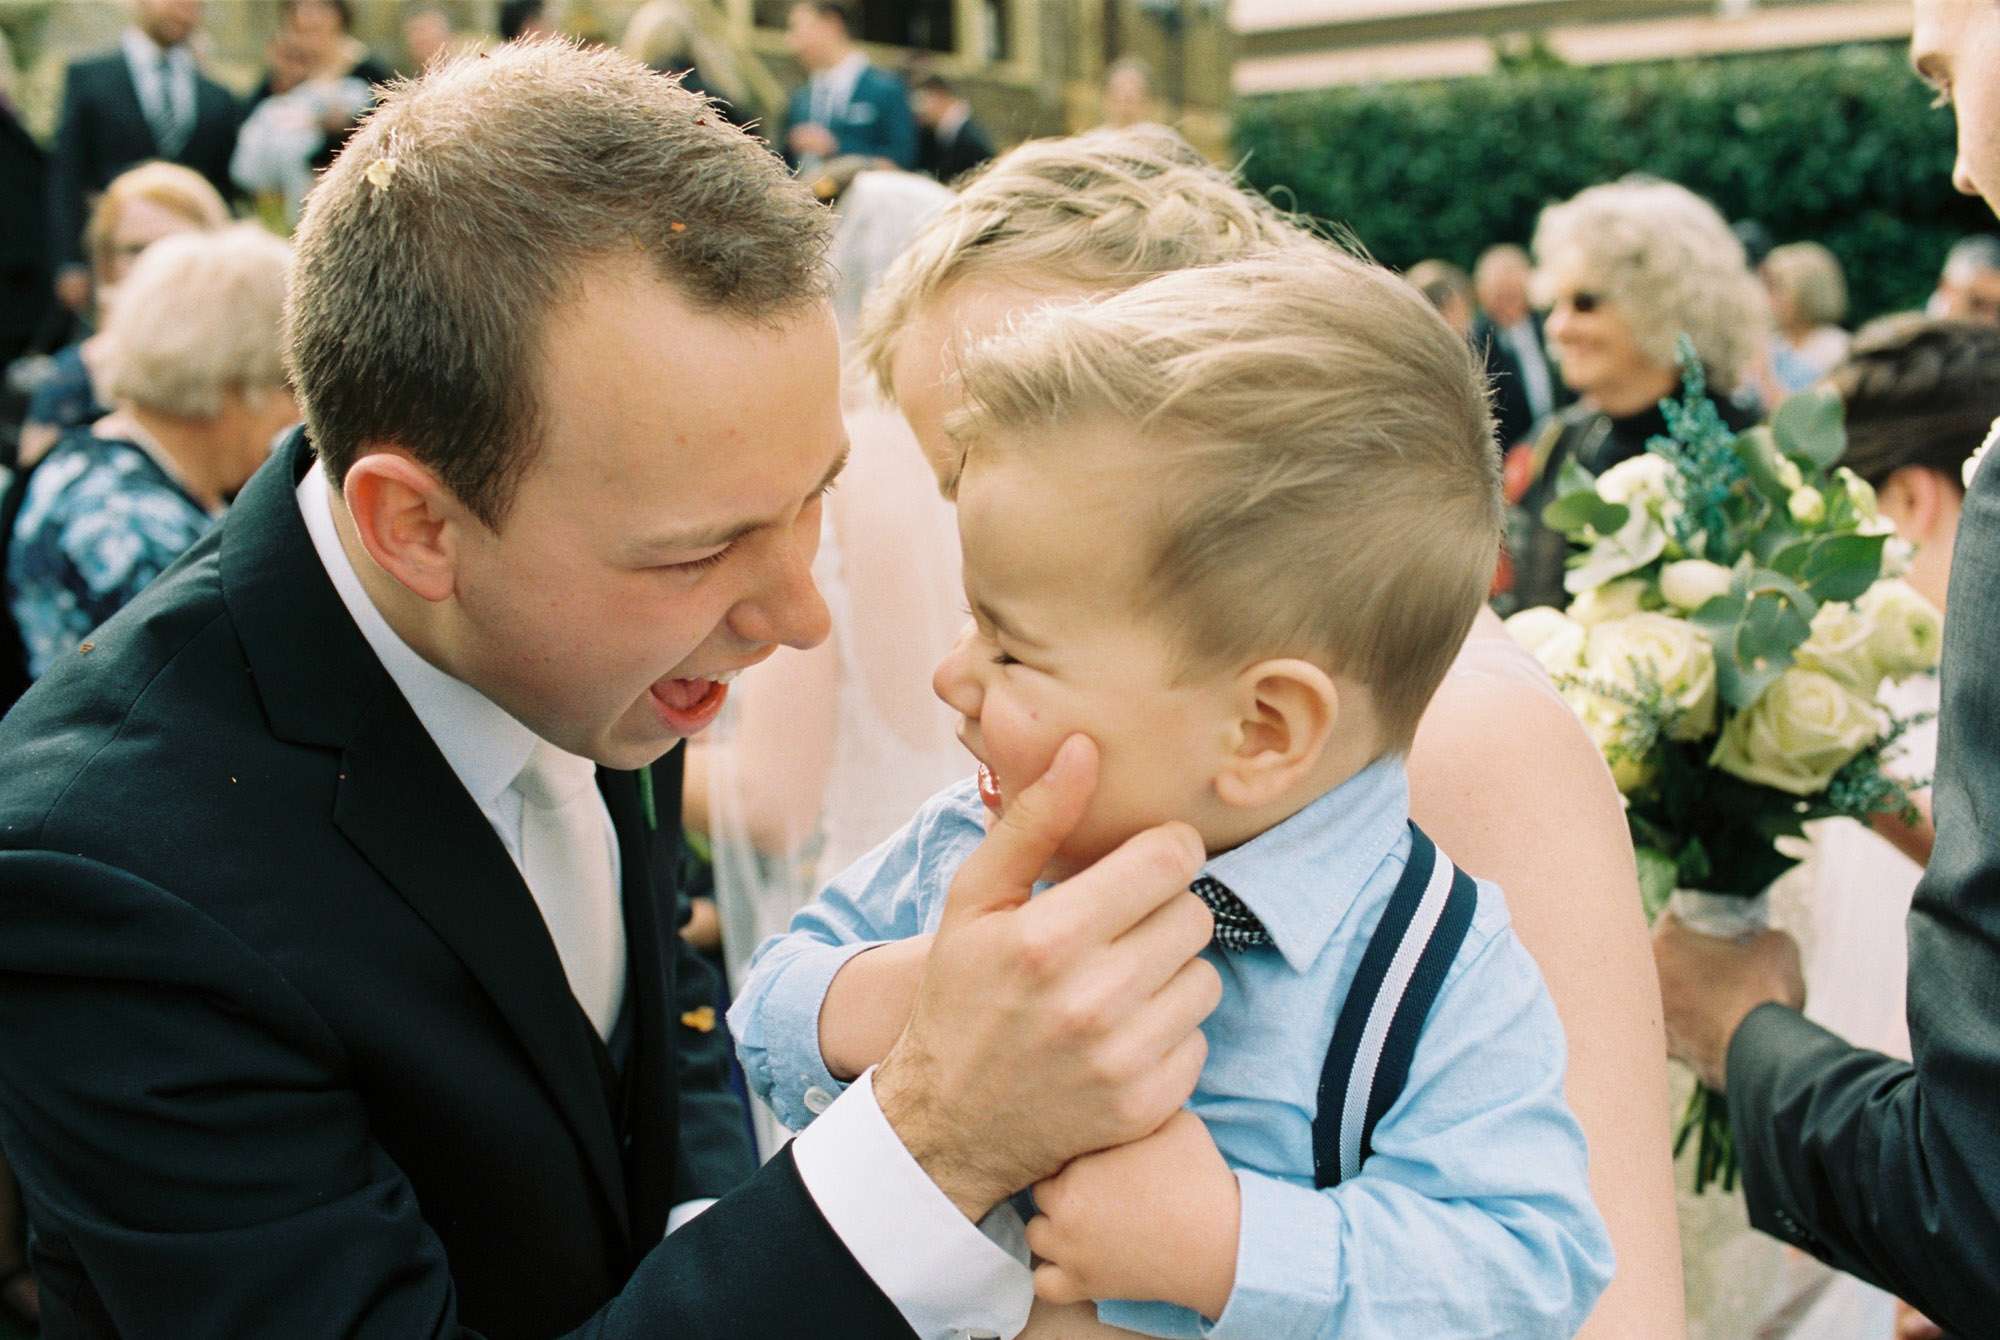 Mount-Lofty-House-wedding-photography-058.jpg